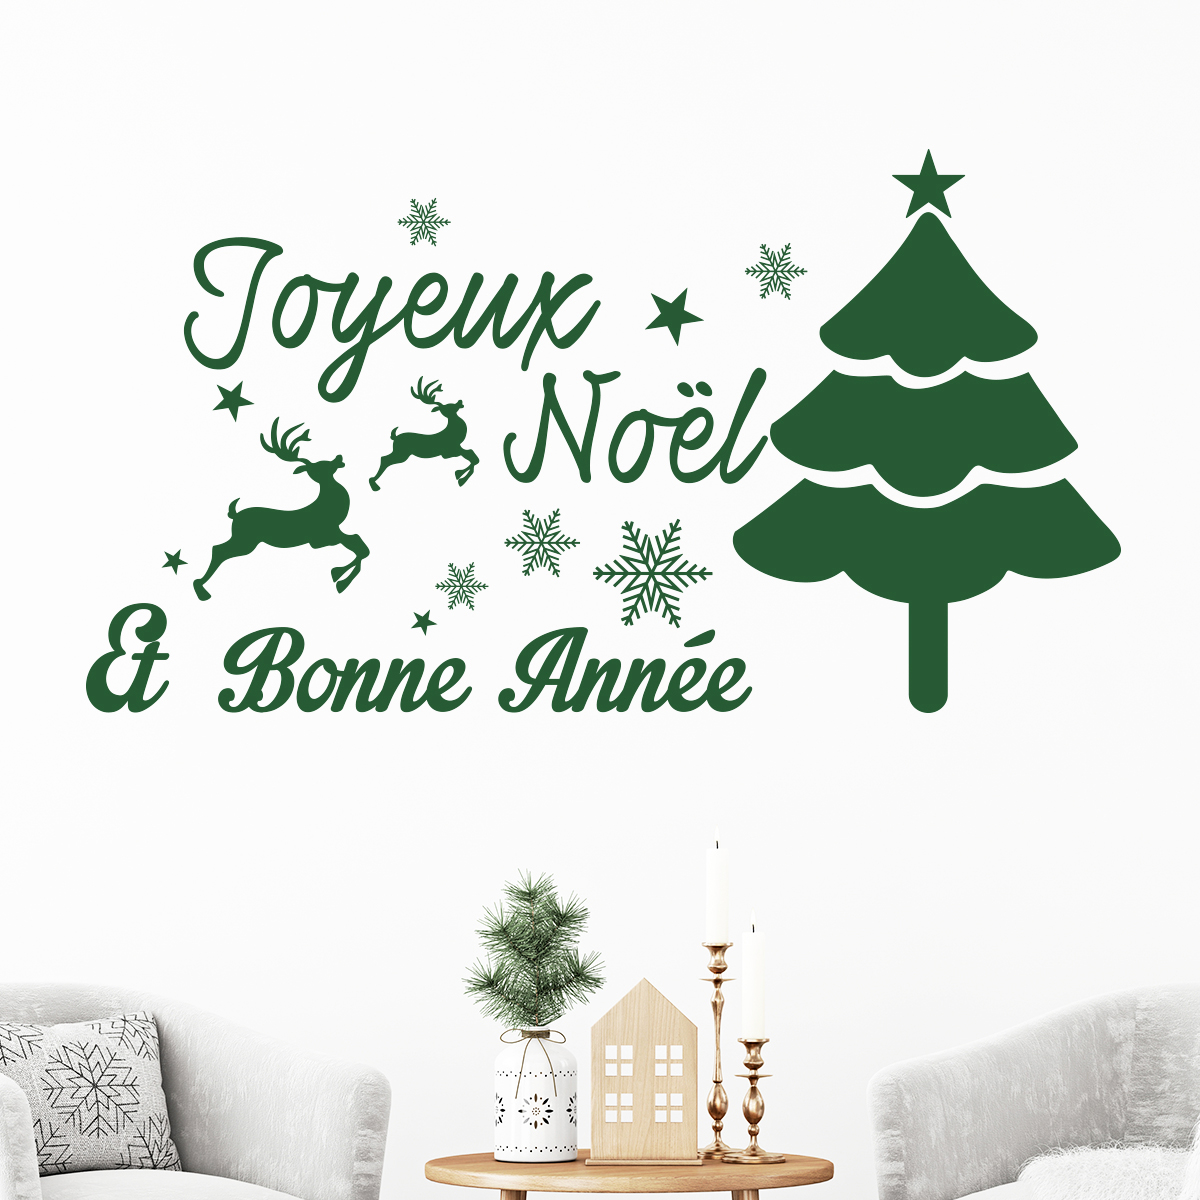 Bonne Annee Joyeux Noel.Sticker Noel Joyeux Noel Et Bonne Annee